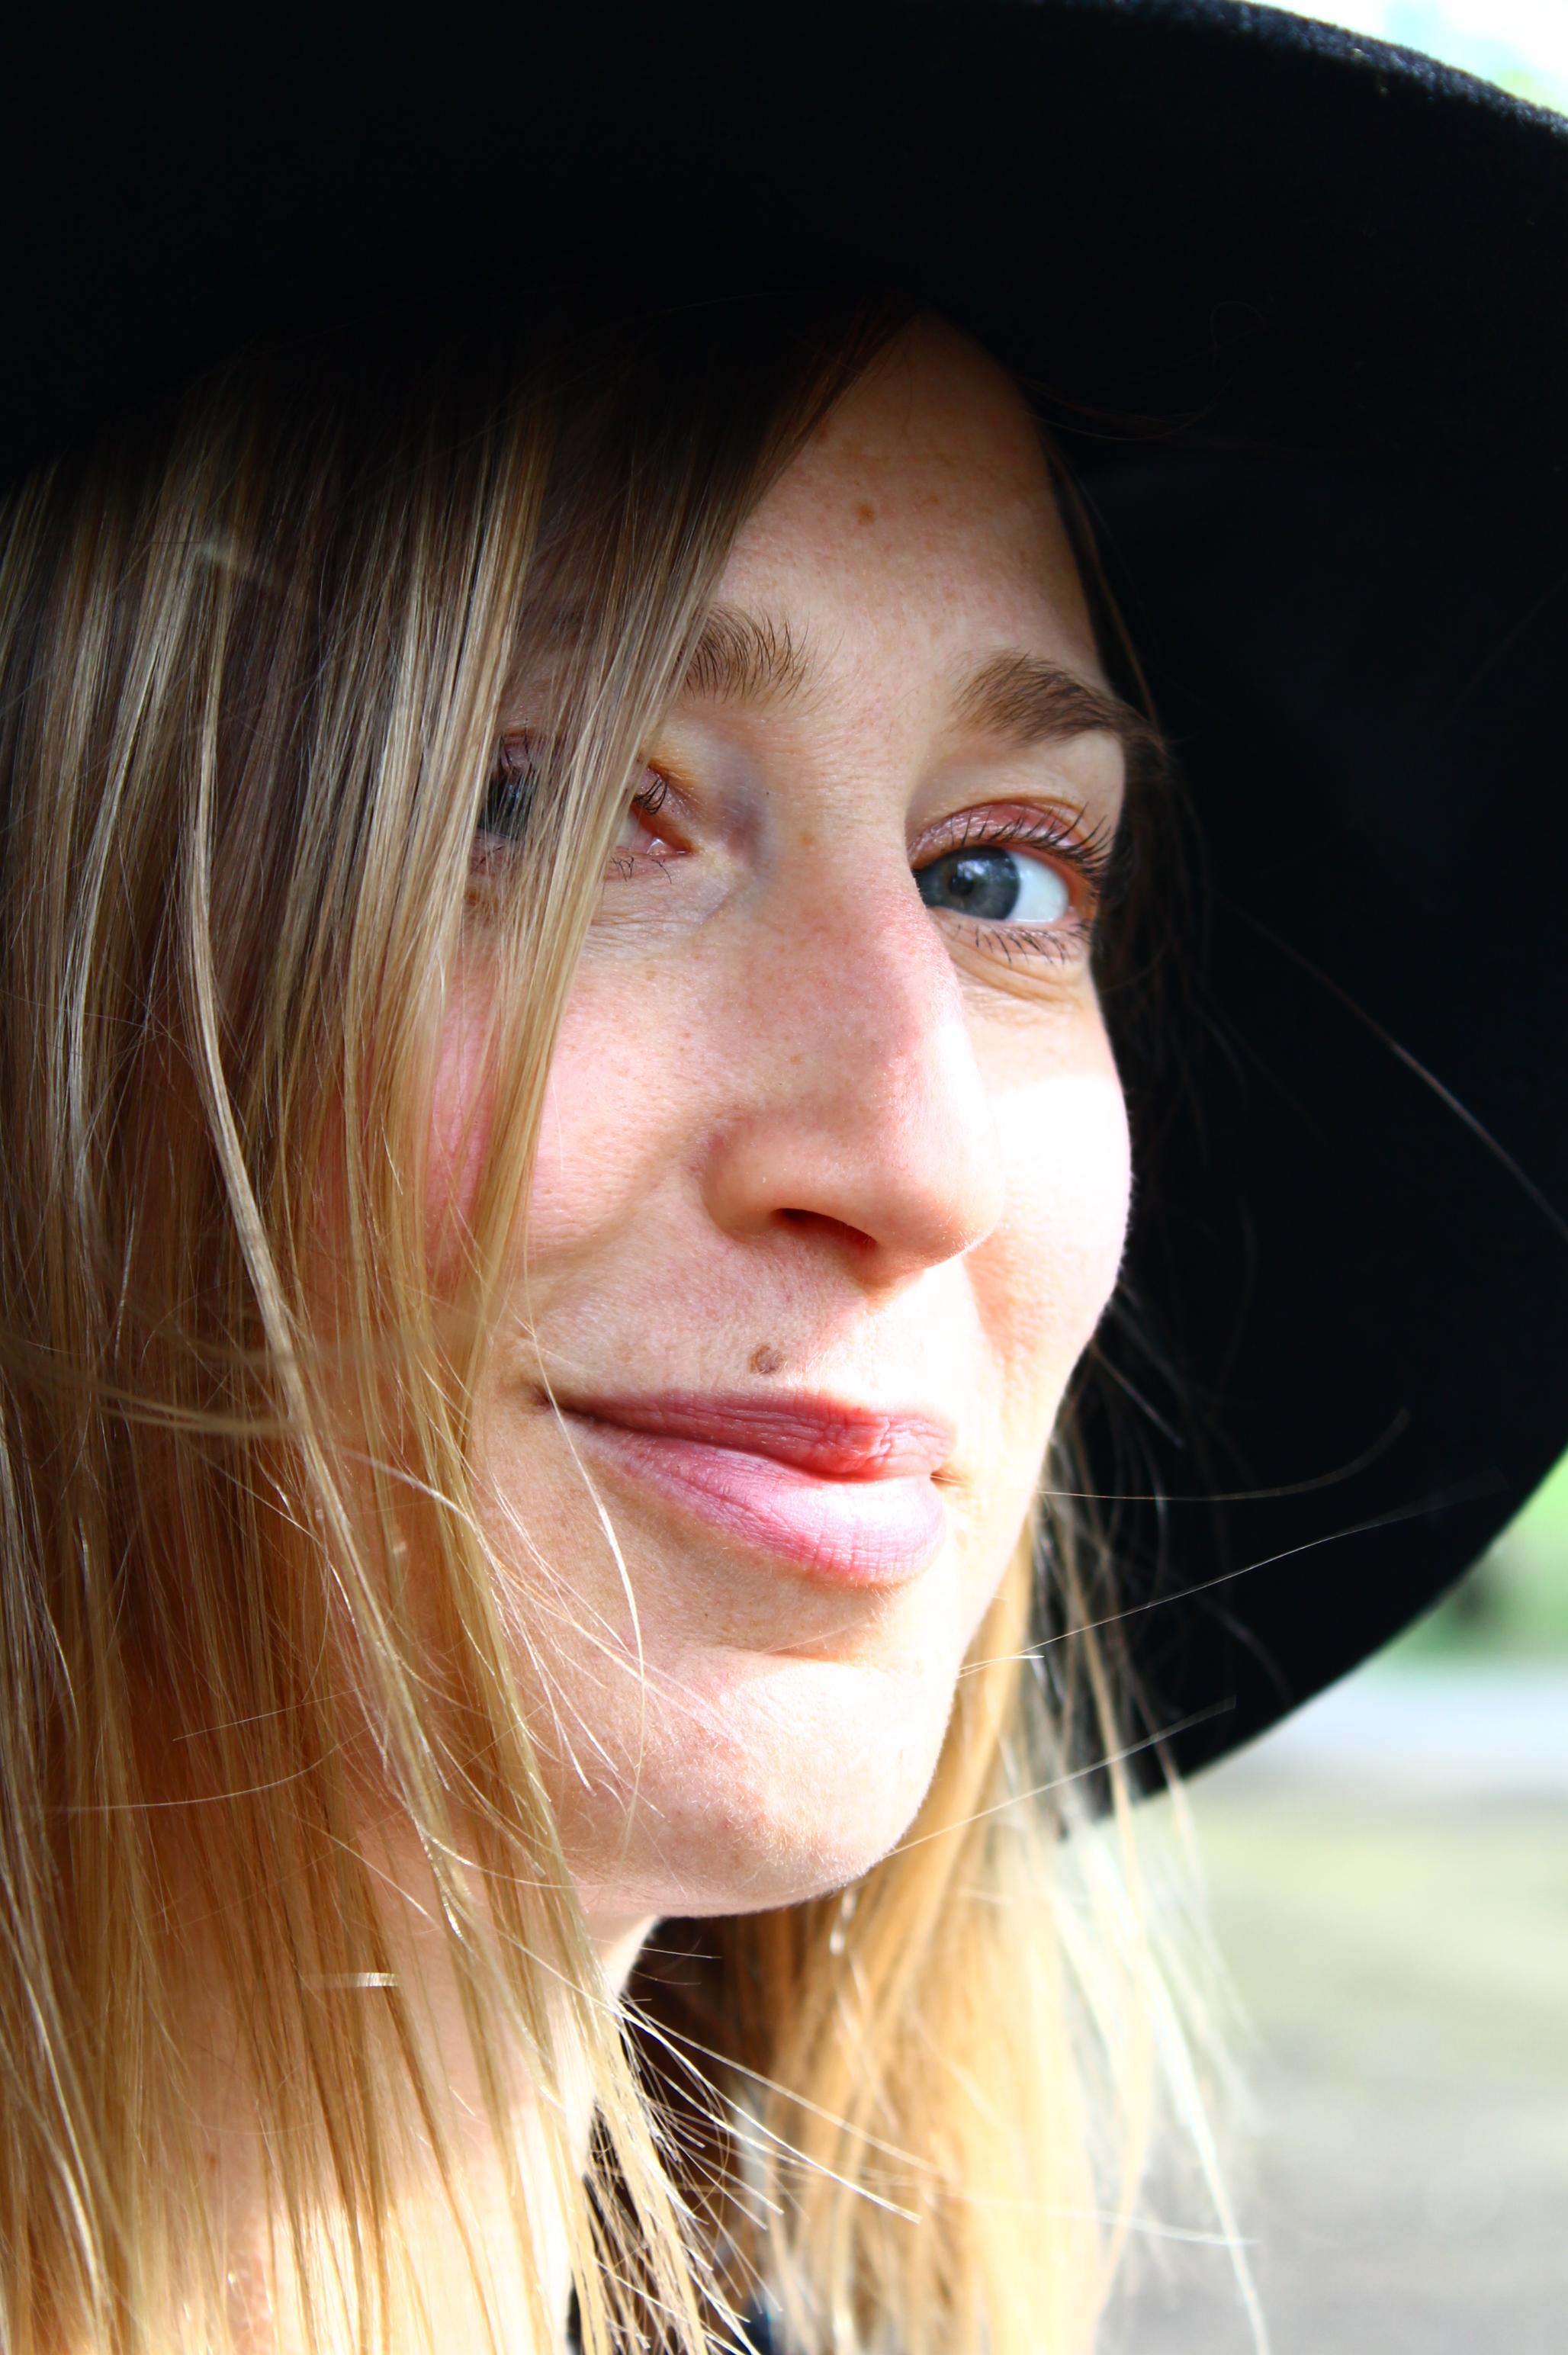 Photo: Hanna Lilja, 2015